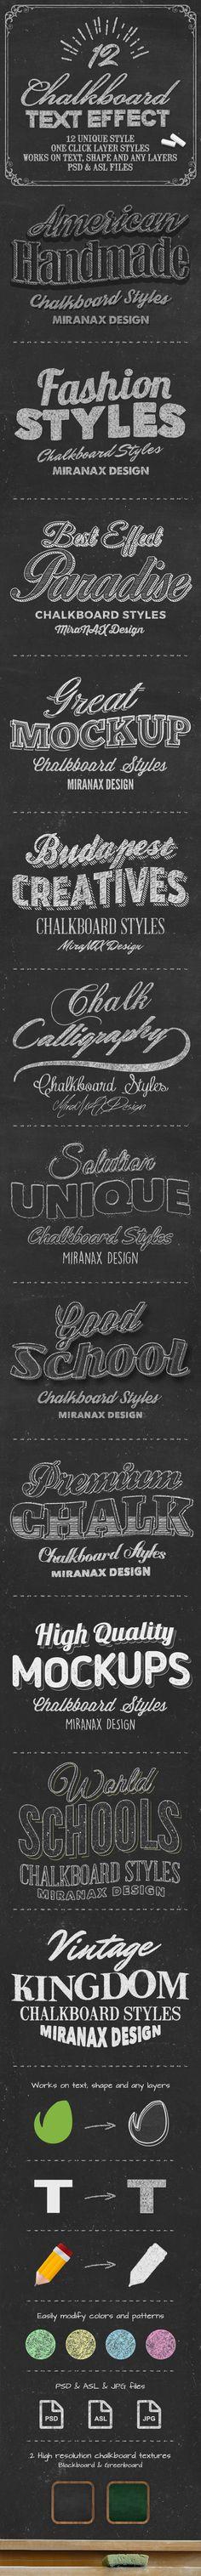 Chalkboard Styles #photoshop Download here: http://graphicriver.net/item/chalkboard-styles/10785351?ref=ksioks